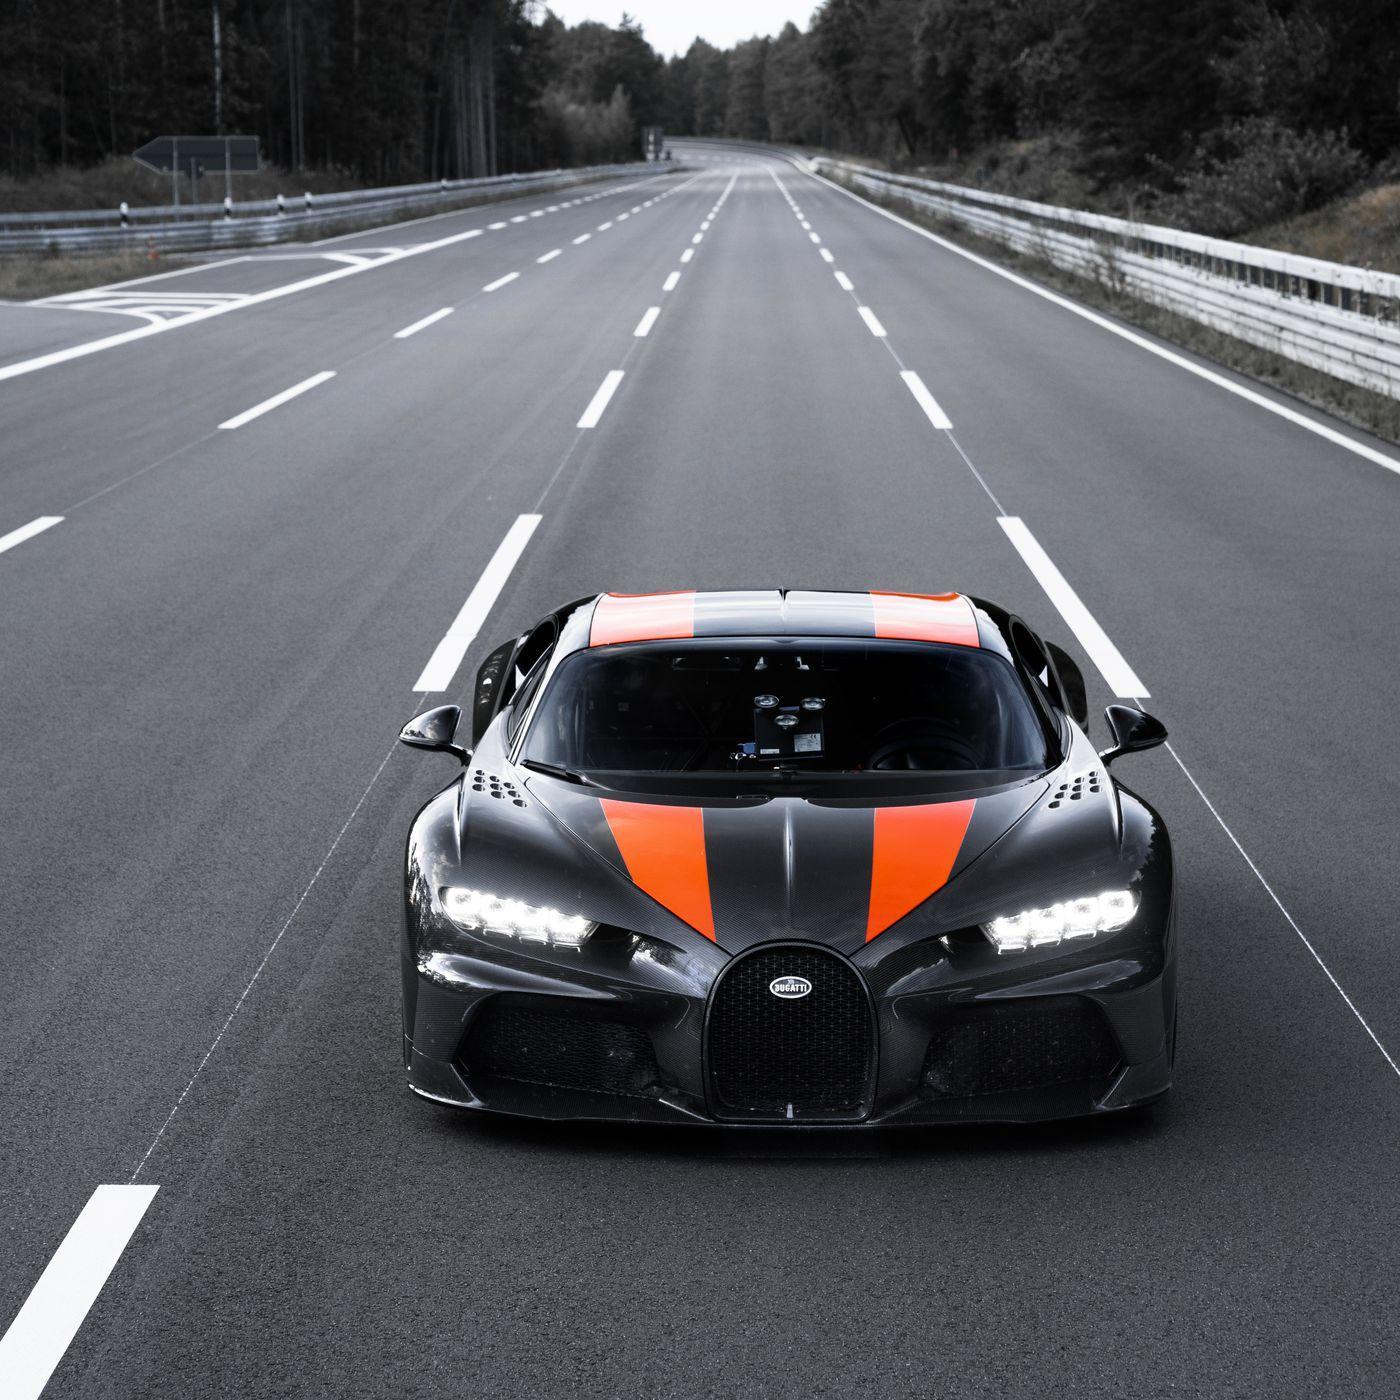 Bugatti Chiron Super Sport 300 Prototype 2019 Wallpapers